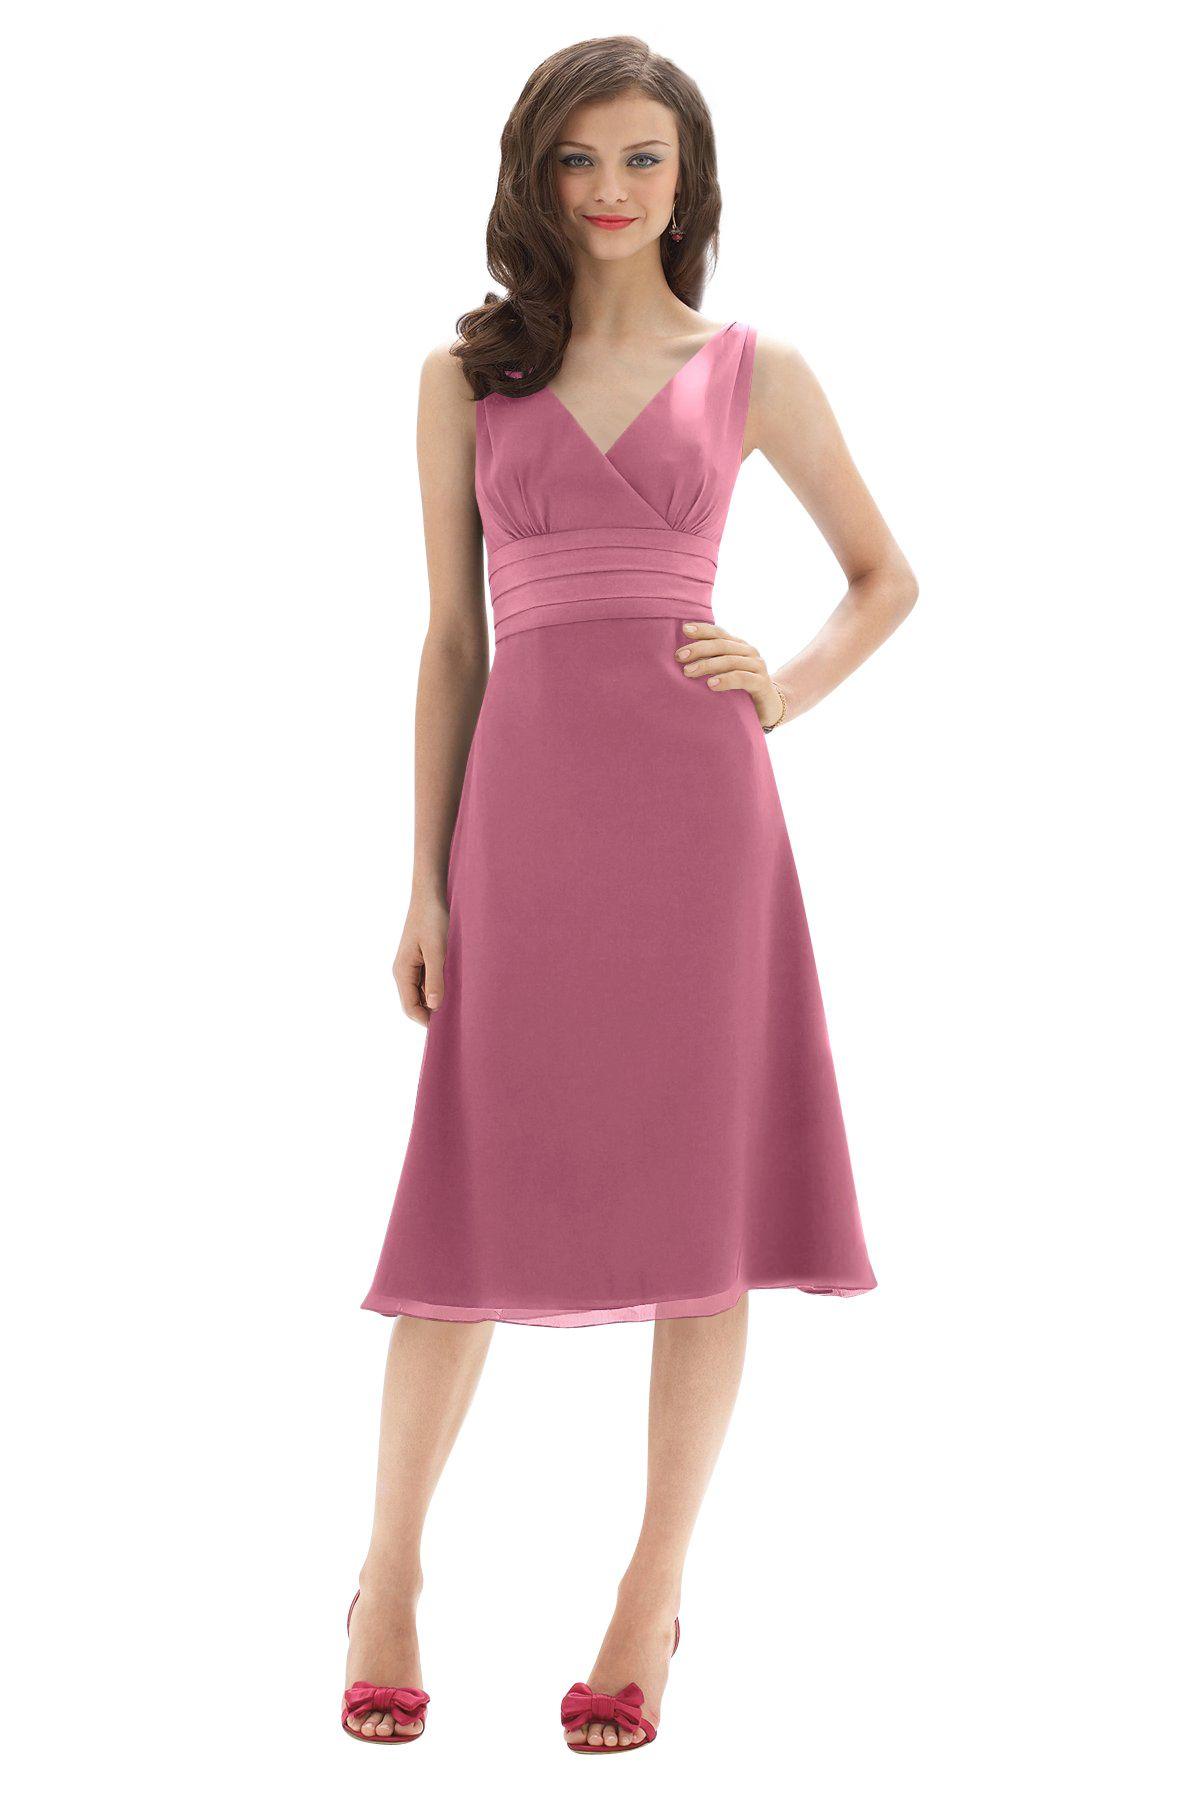 Wtoo 519 Bridesmaid Dress   Weddington Way $196   Dn   Pinterest   Combi